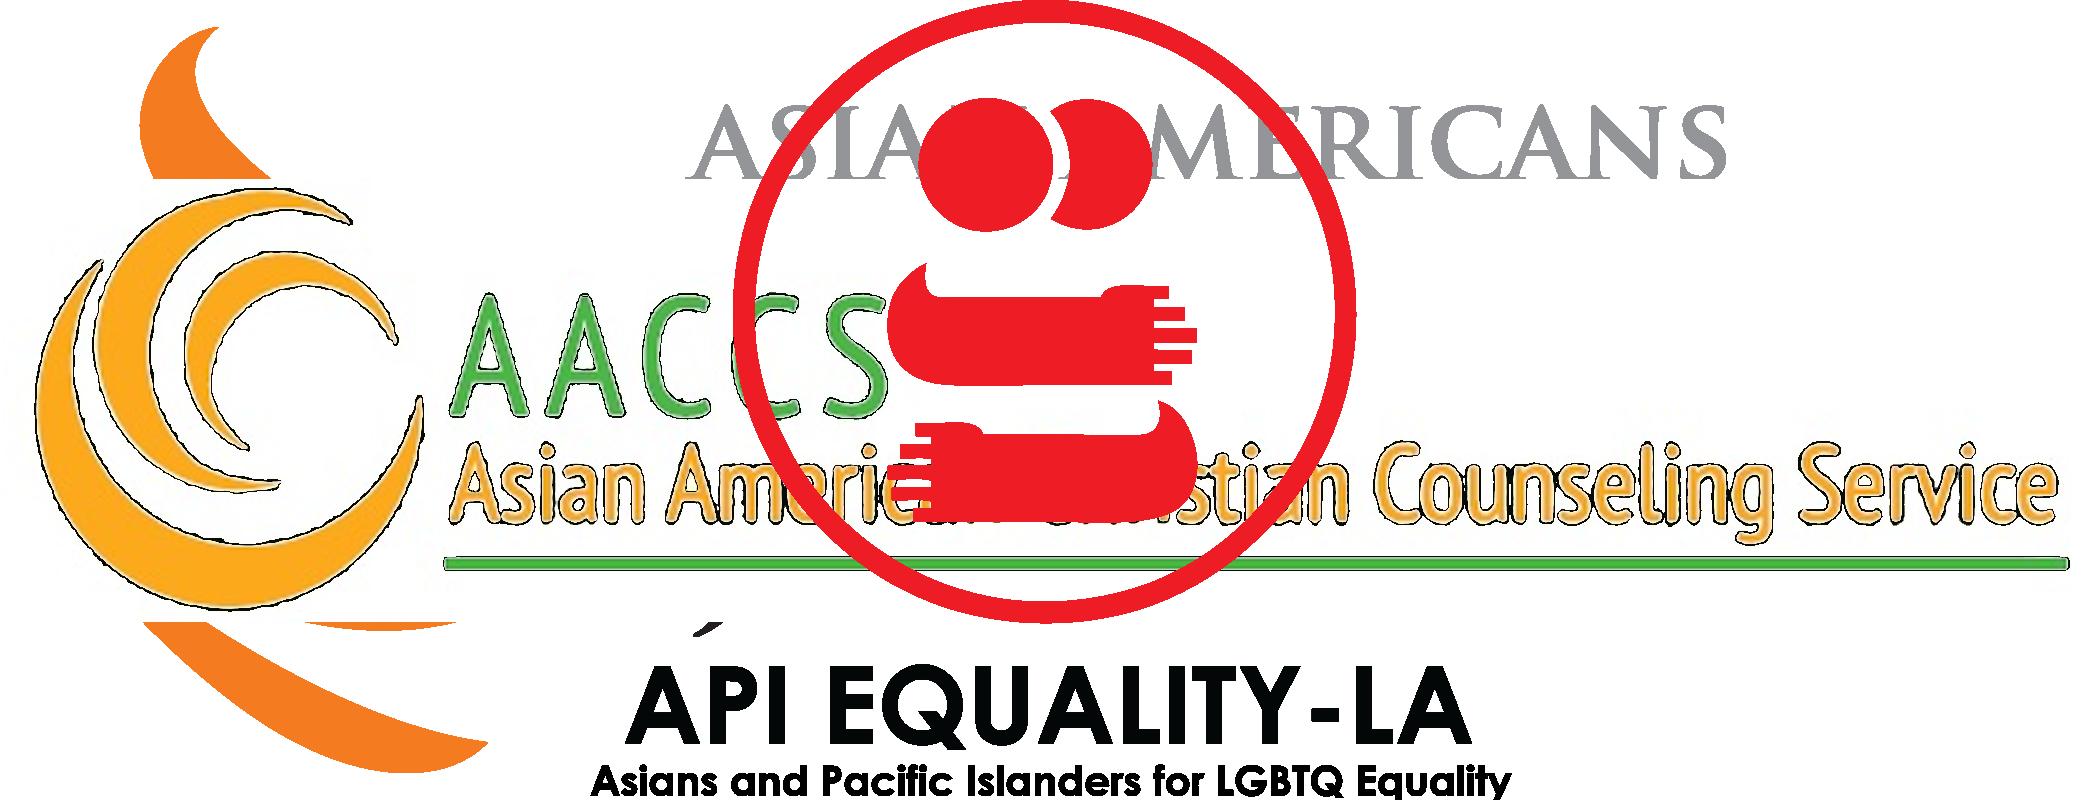 - API Equality LA1137 Wilshire Blvd #101Los Angeles, CA 90017(213) 580-1800 | apiequalityla.org